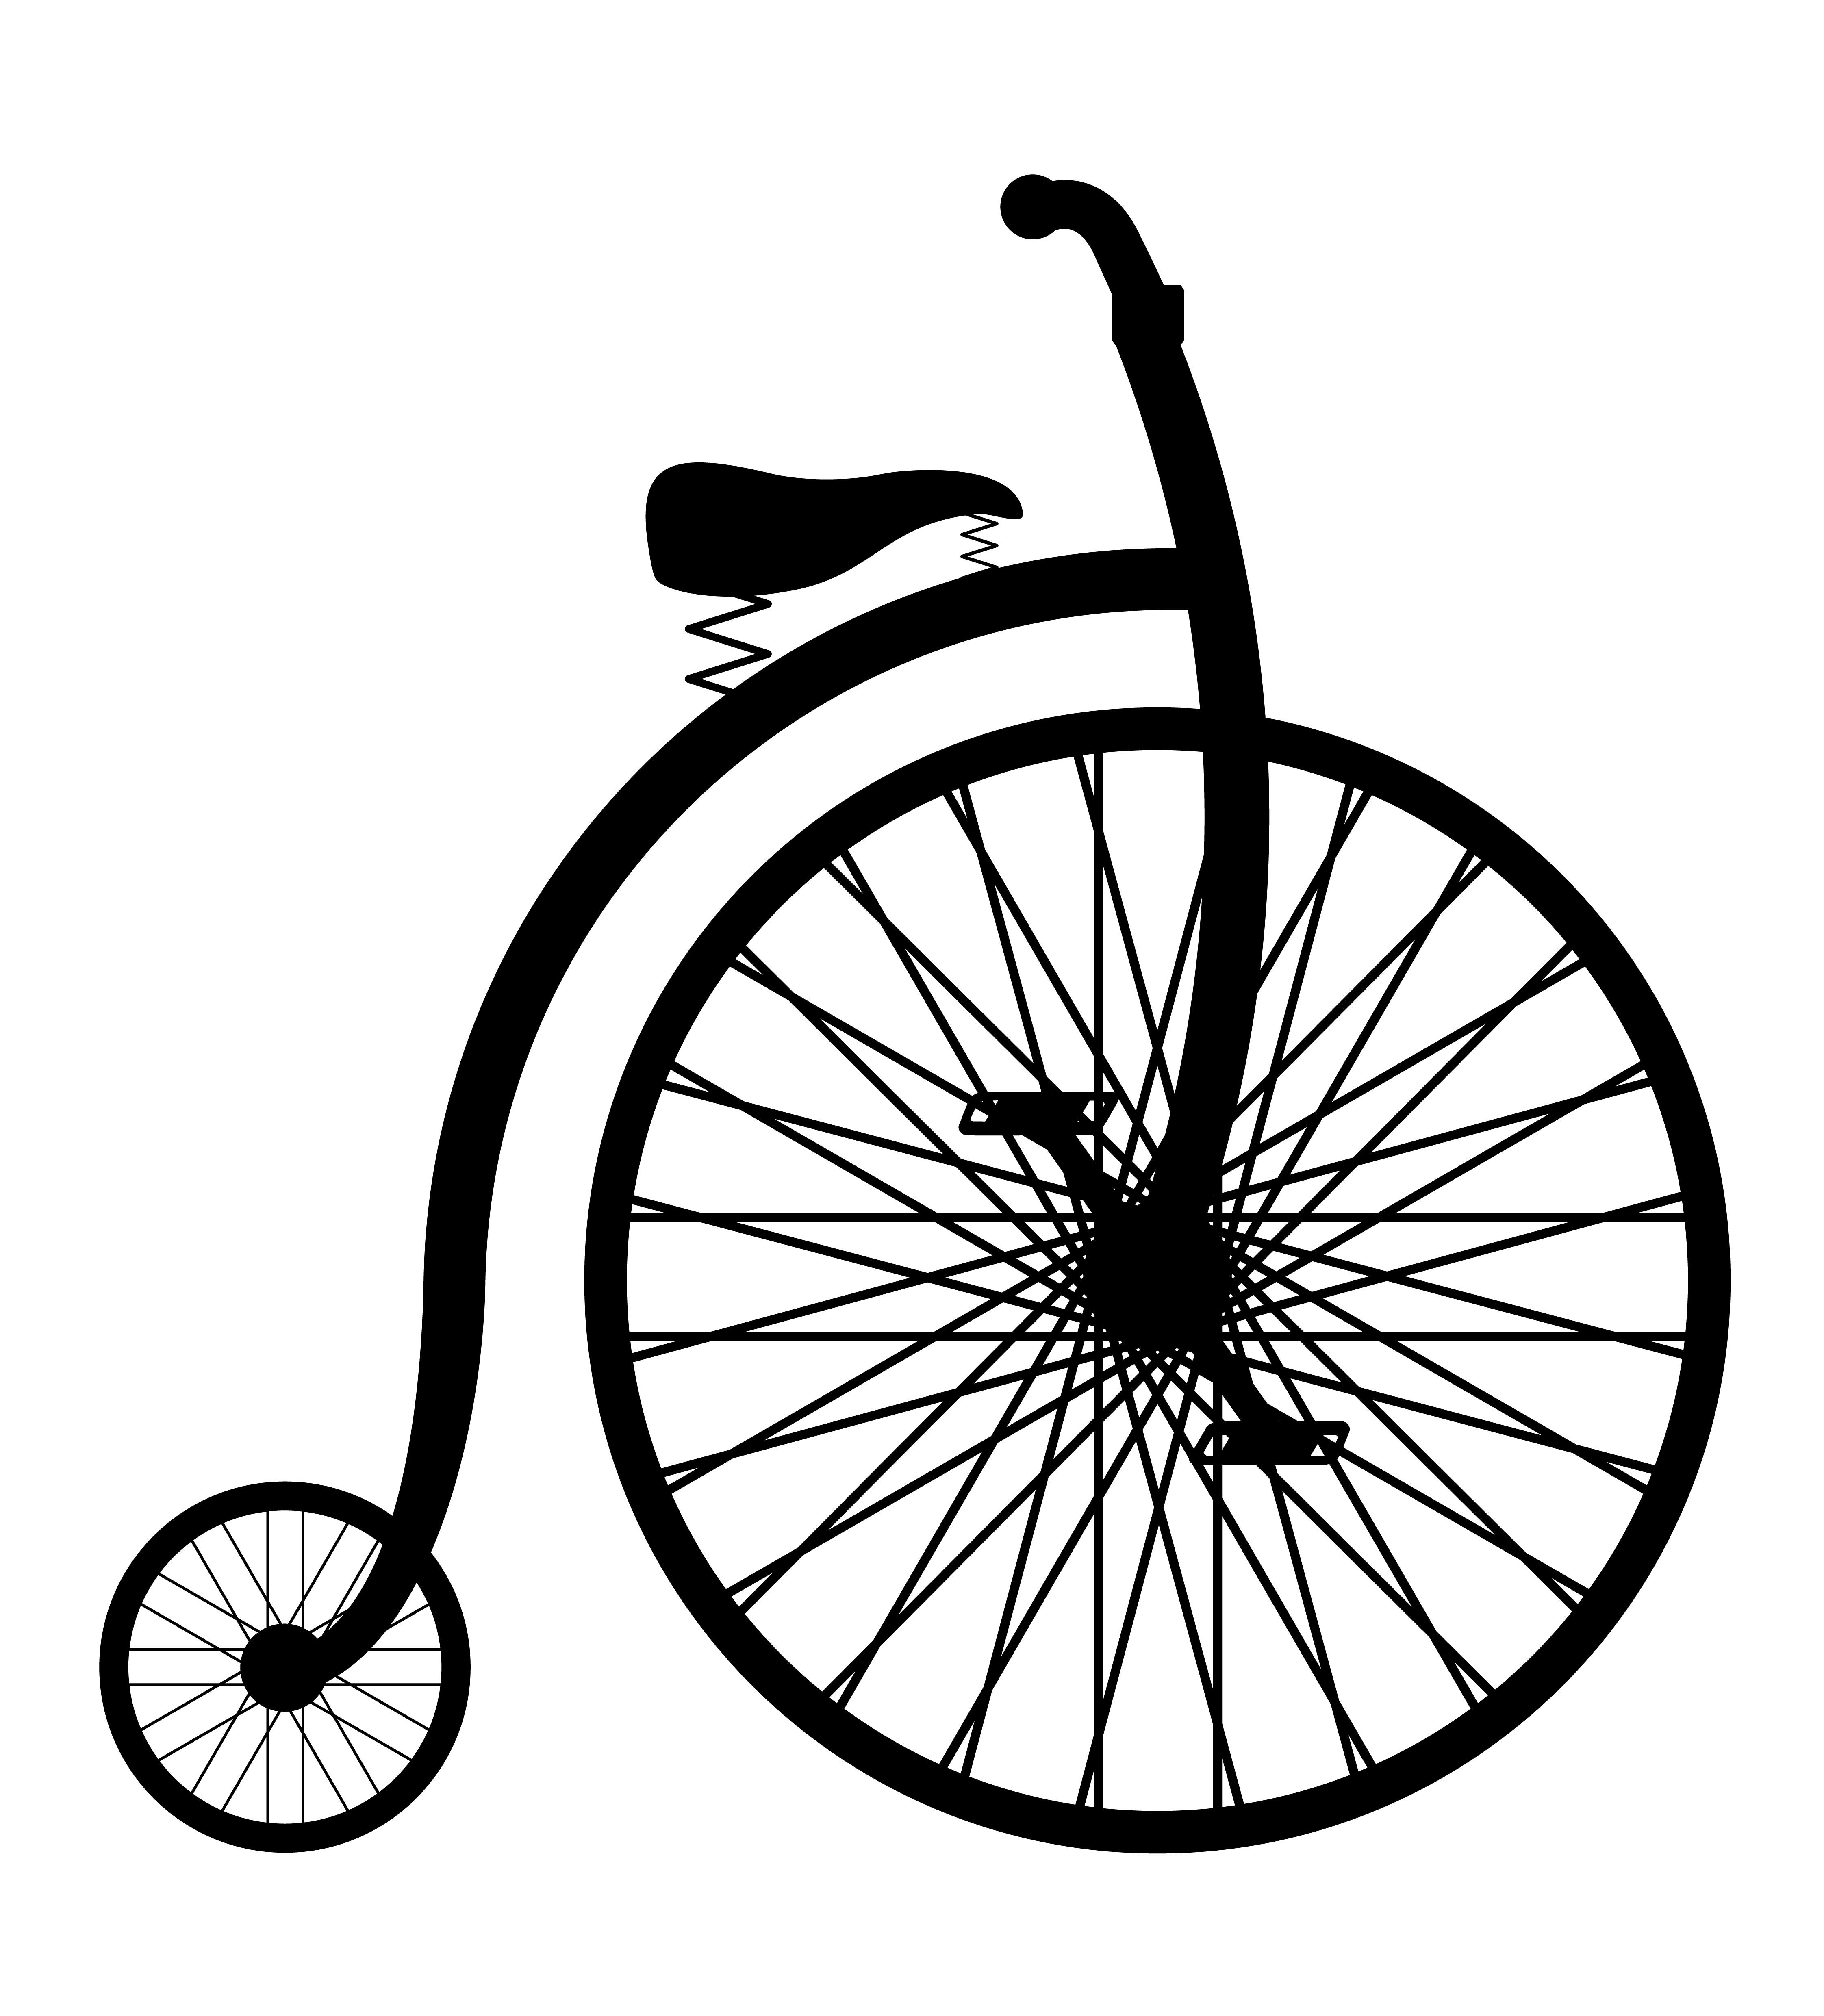 bike old retro vintage icon stock vector illustration ...